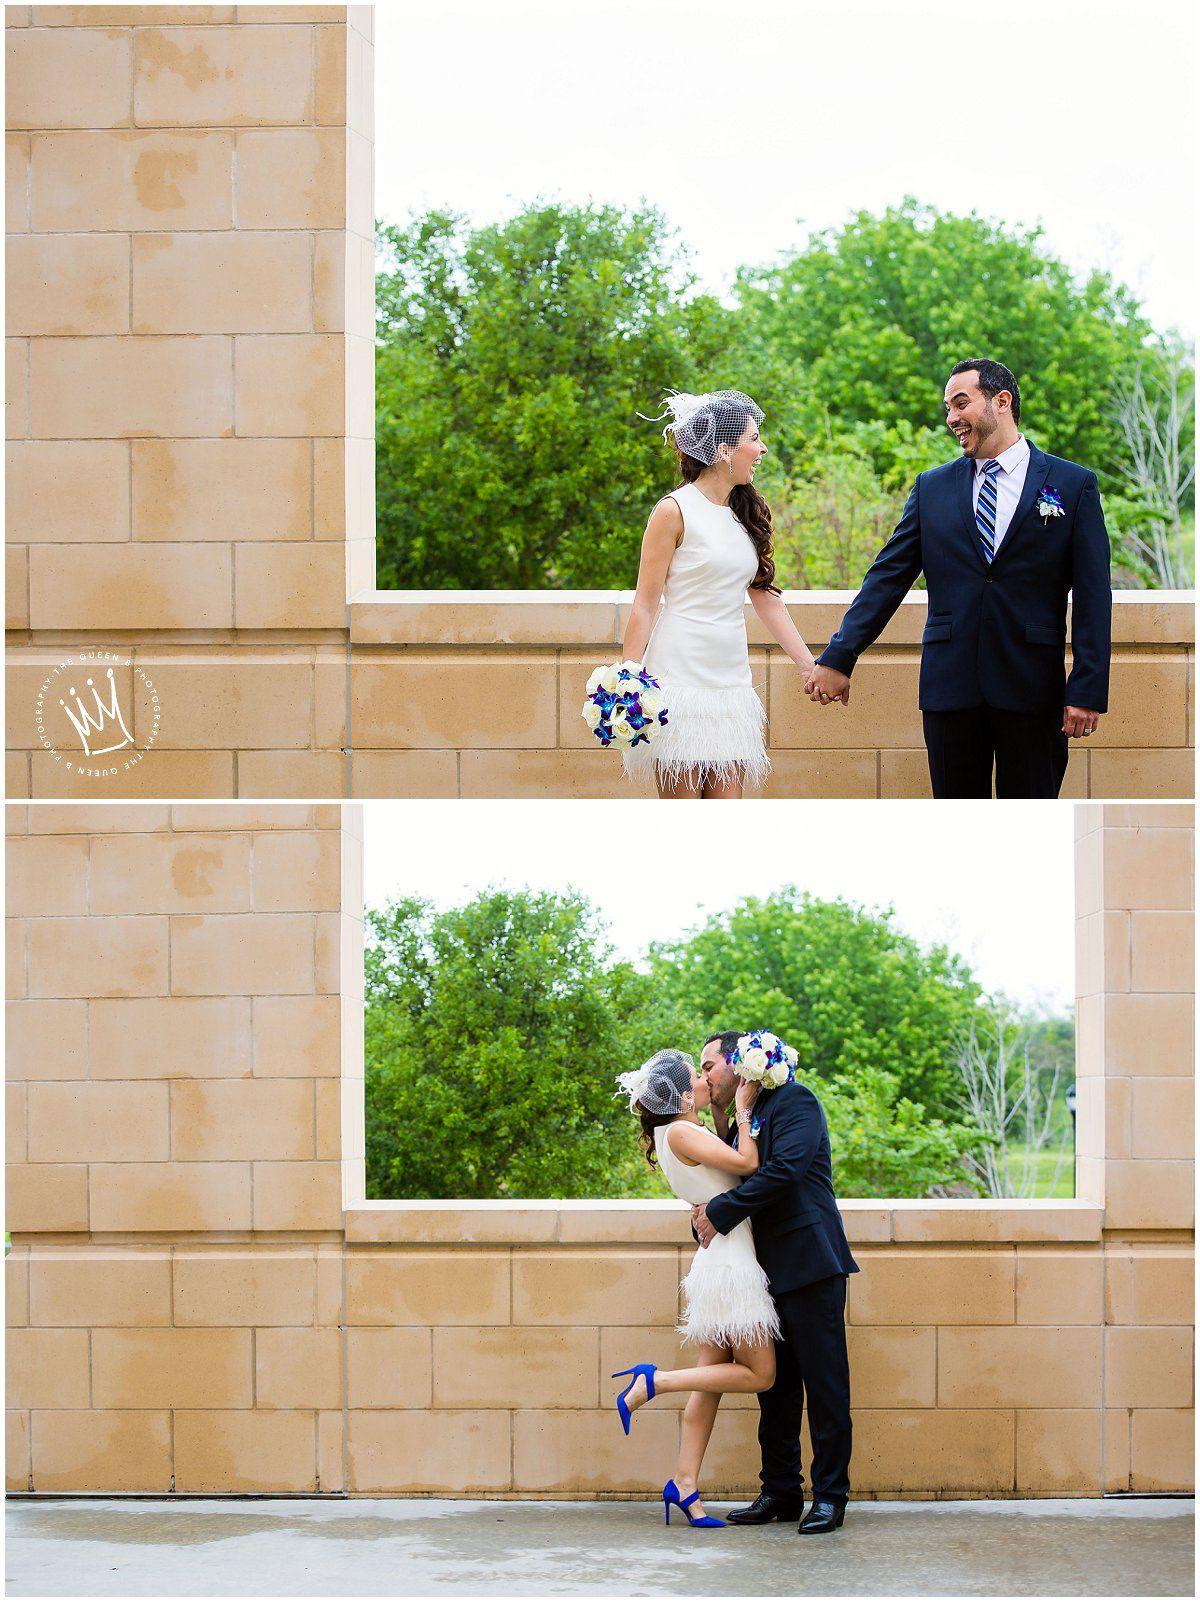 Houston Wedding Photographer Houston wedding photography